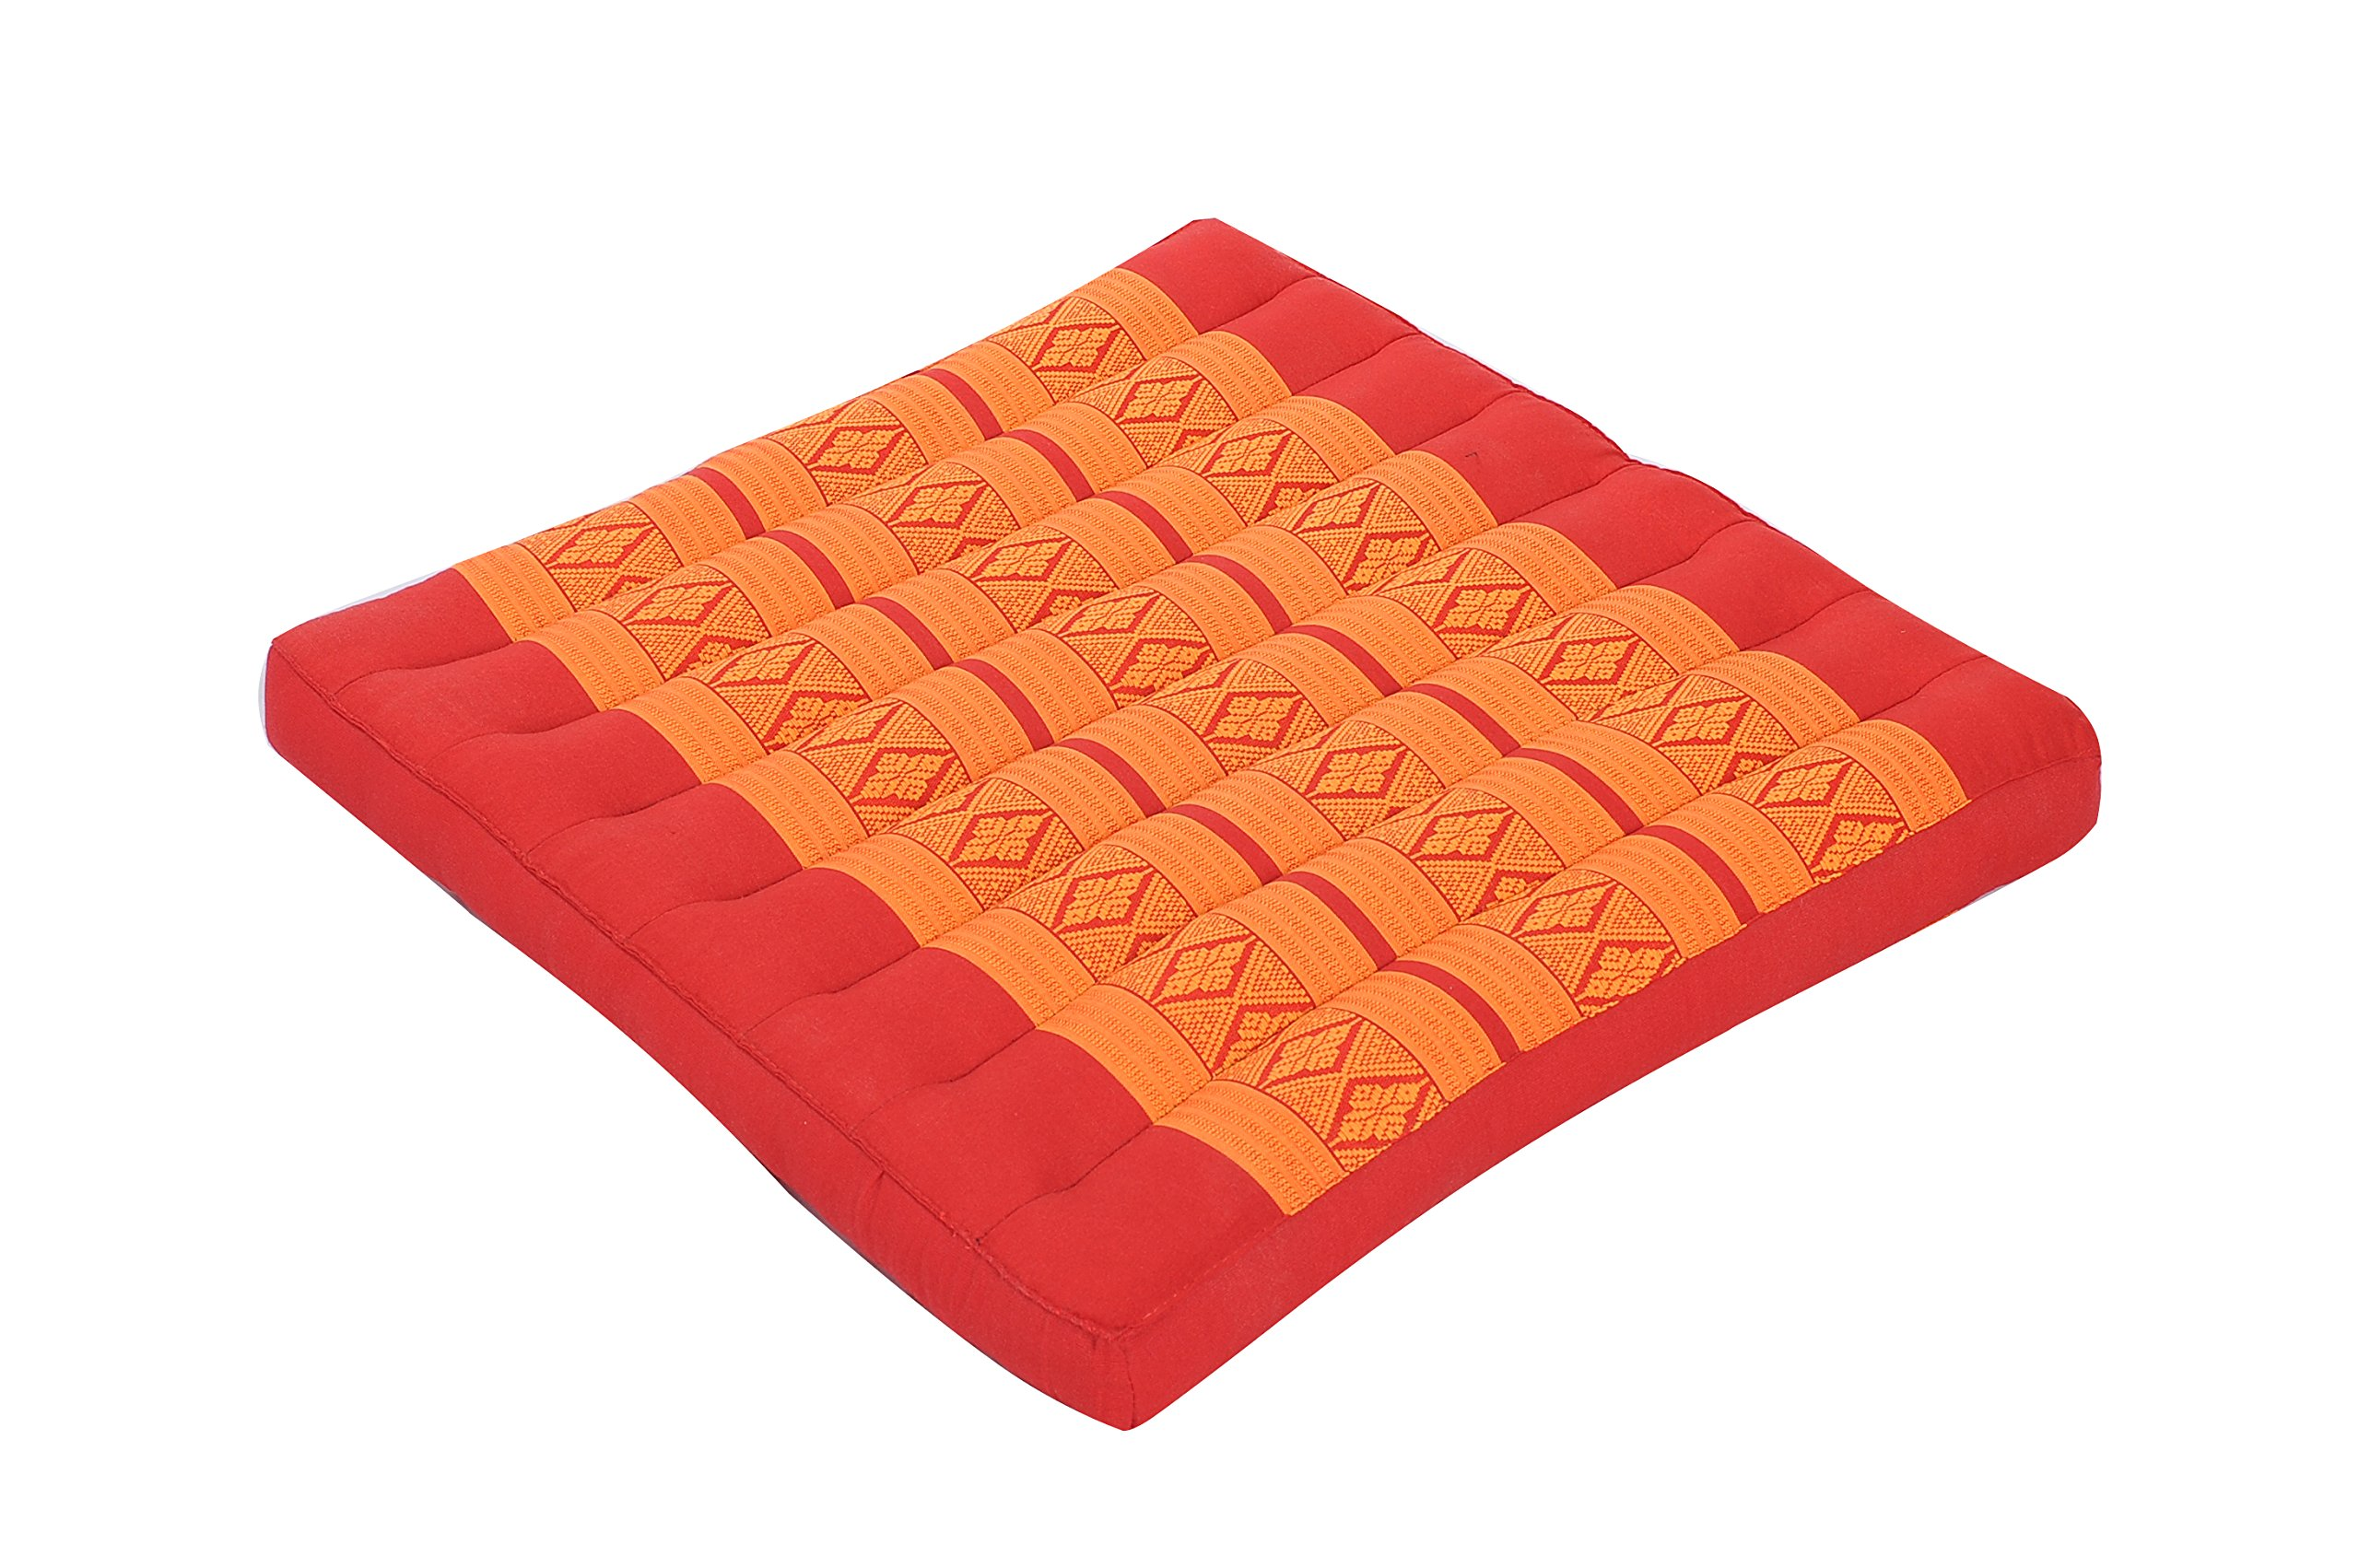 Kapok Dreams Seat Cushion 20''x20''x2'', Thai Design Orange & Red, Firm Natural Kapok Filling, Great as Floor Pillow Meditation Zabuton